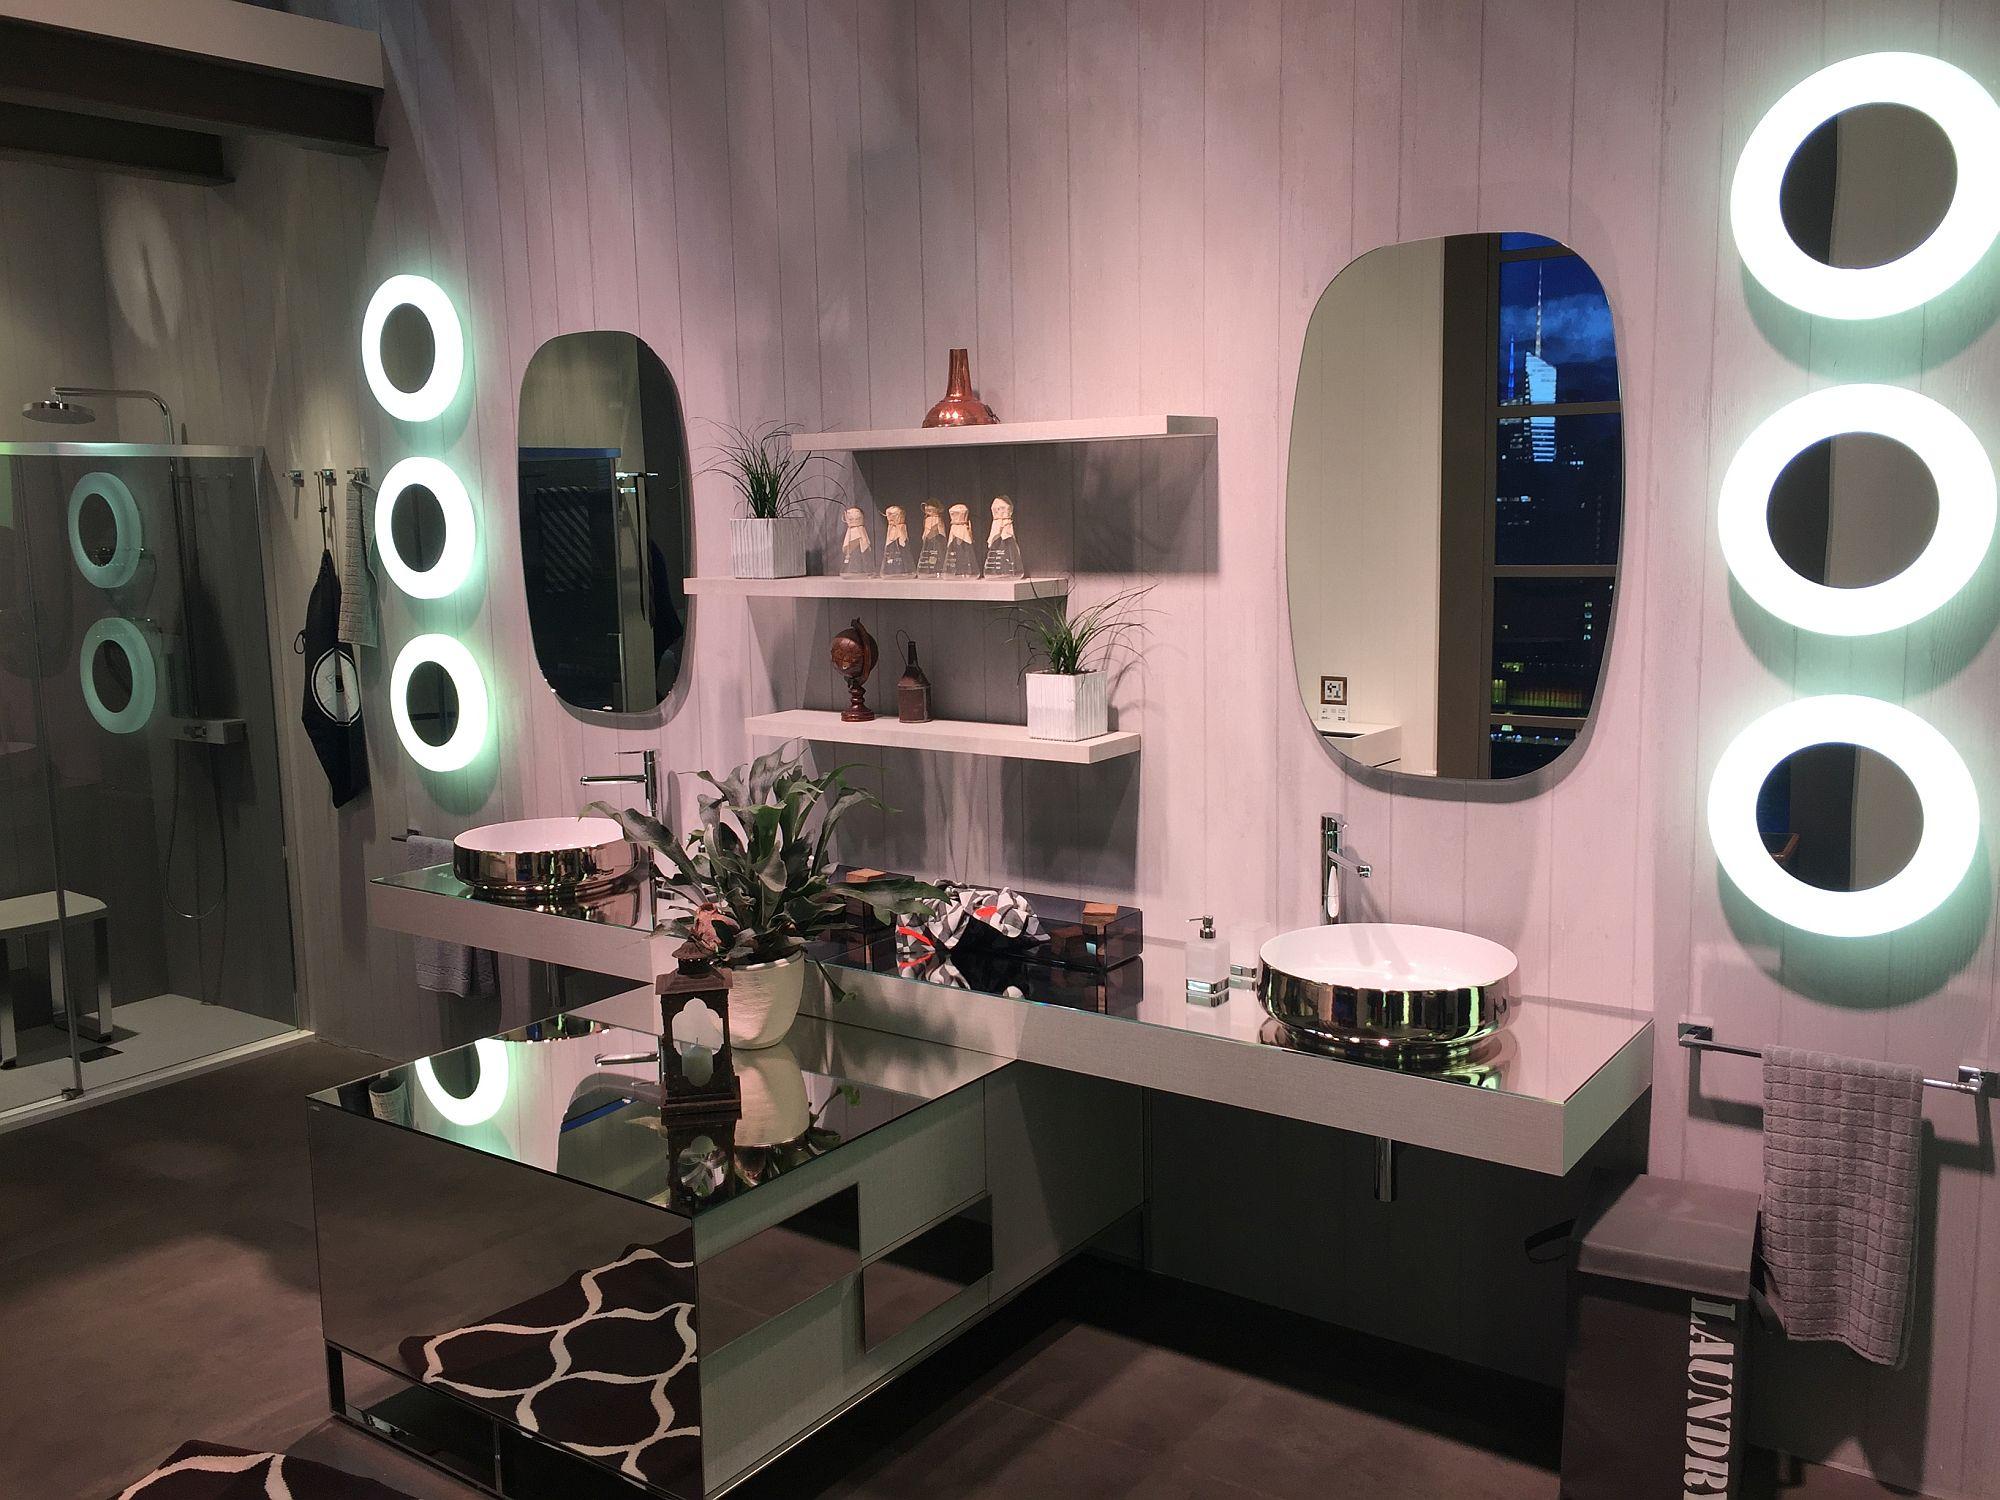 Exquisite lighting and bathroom mirror ideas from INDA